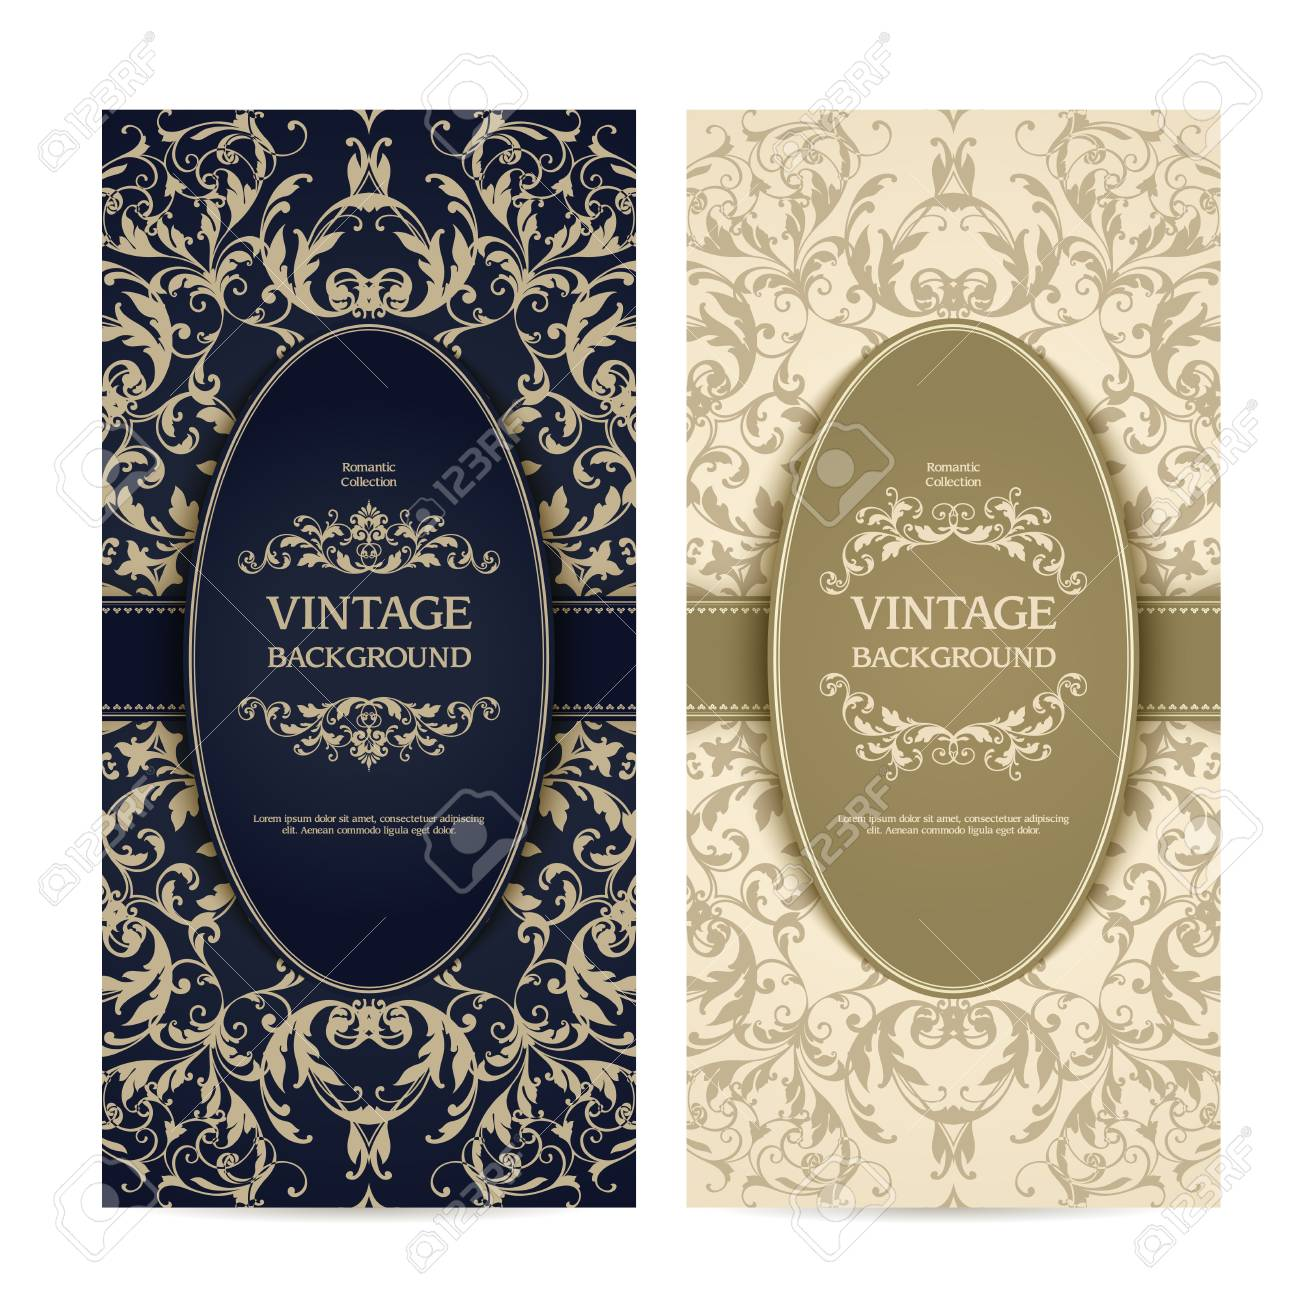 Vintage Template Set With Ornamental Frames And Patterned Background